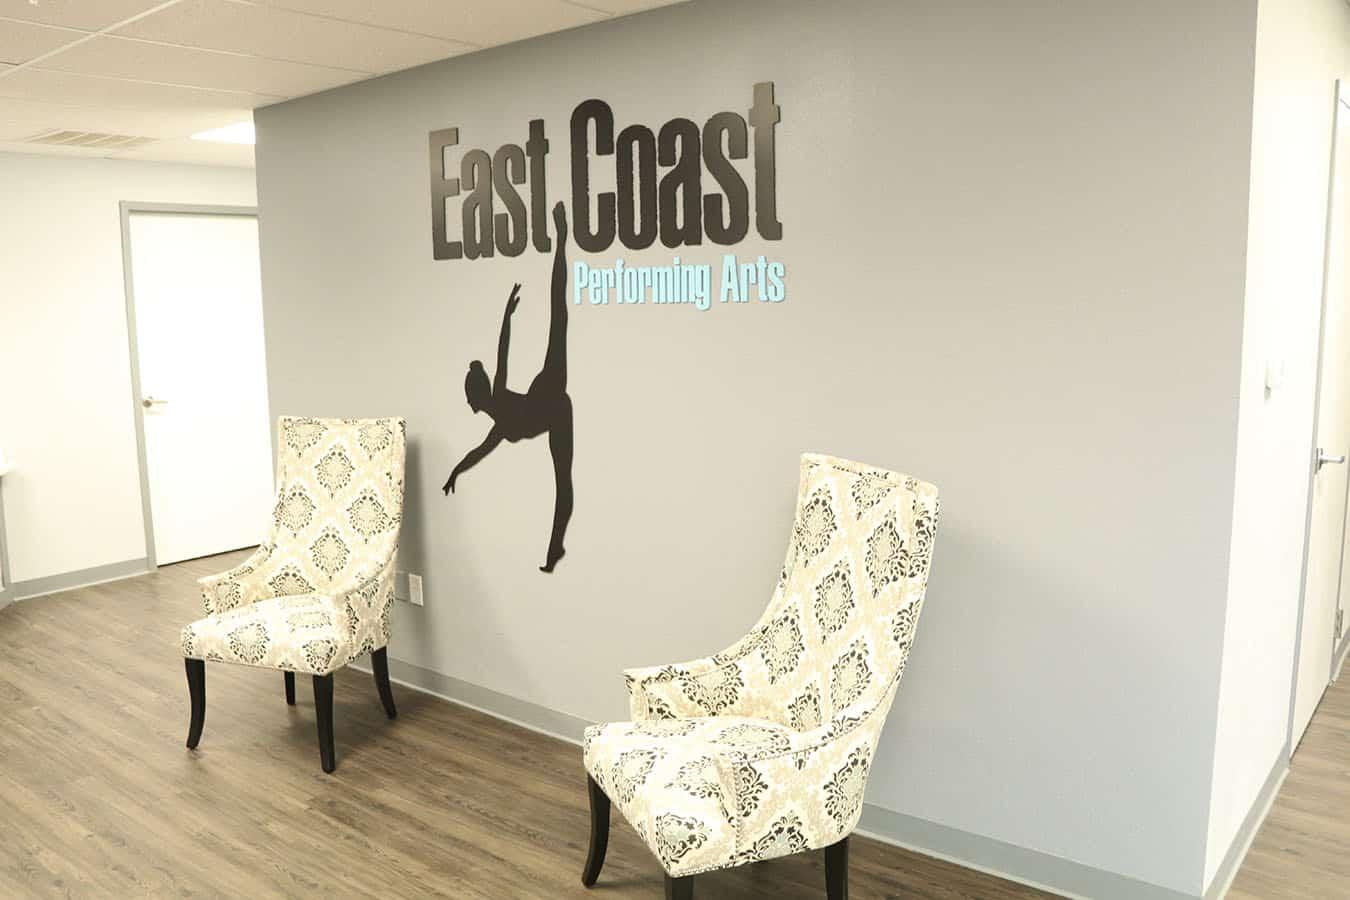 east-coast-performing-arts-1